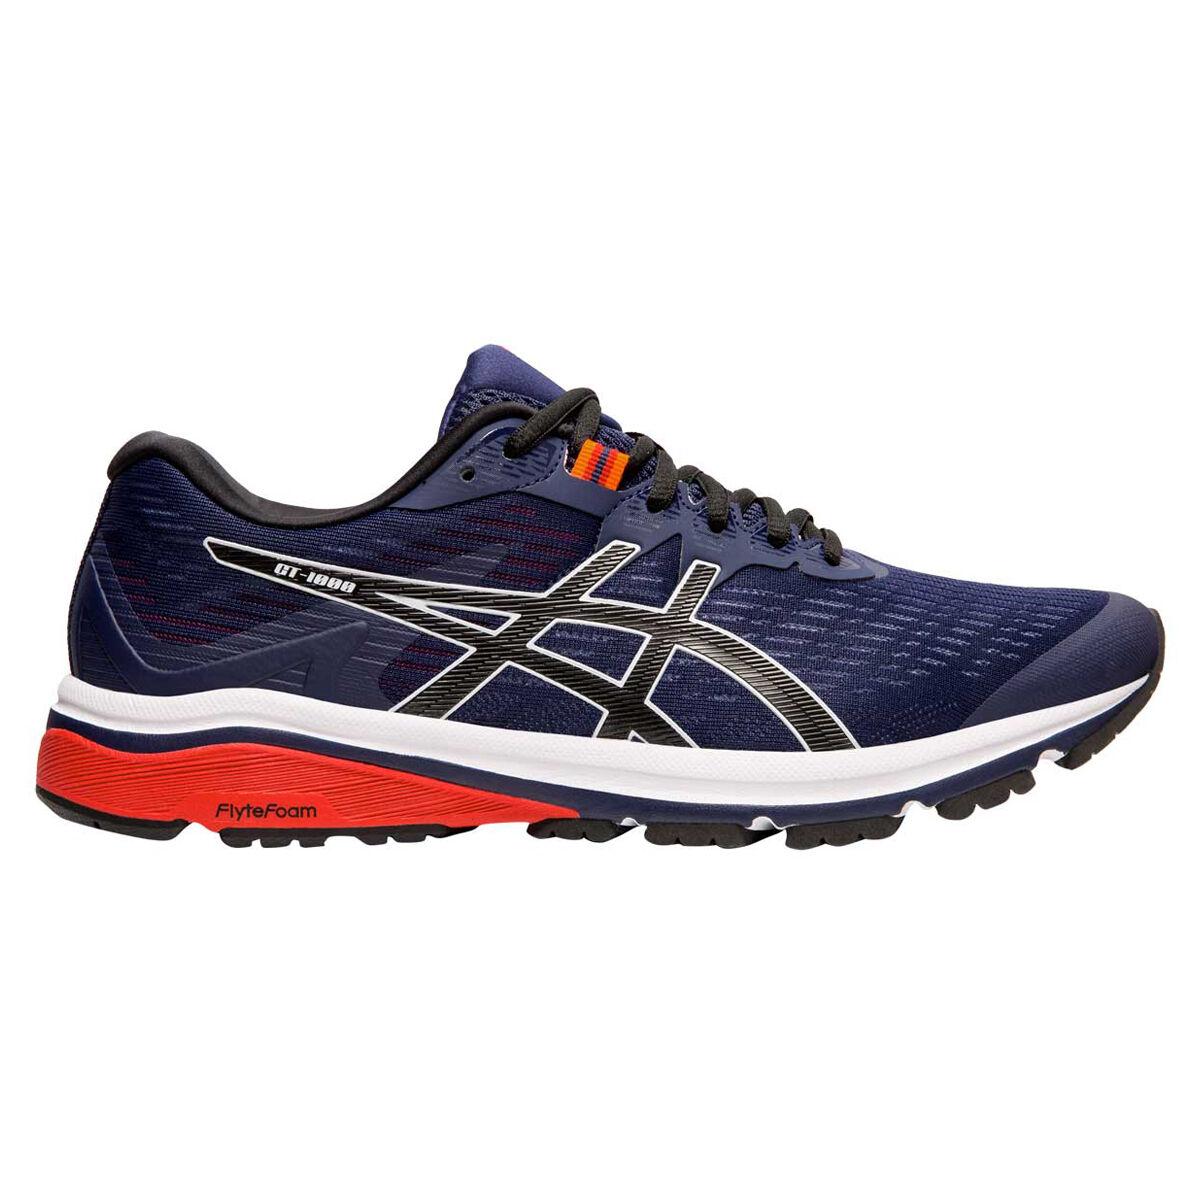 Asics GT 1000 8 2E Mens Running Shoes